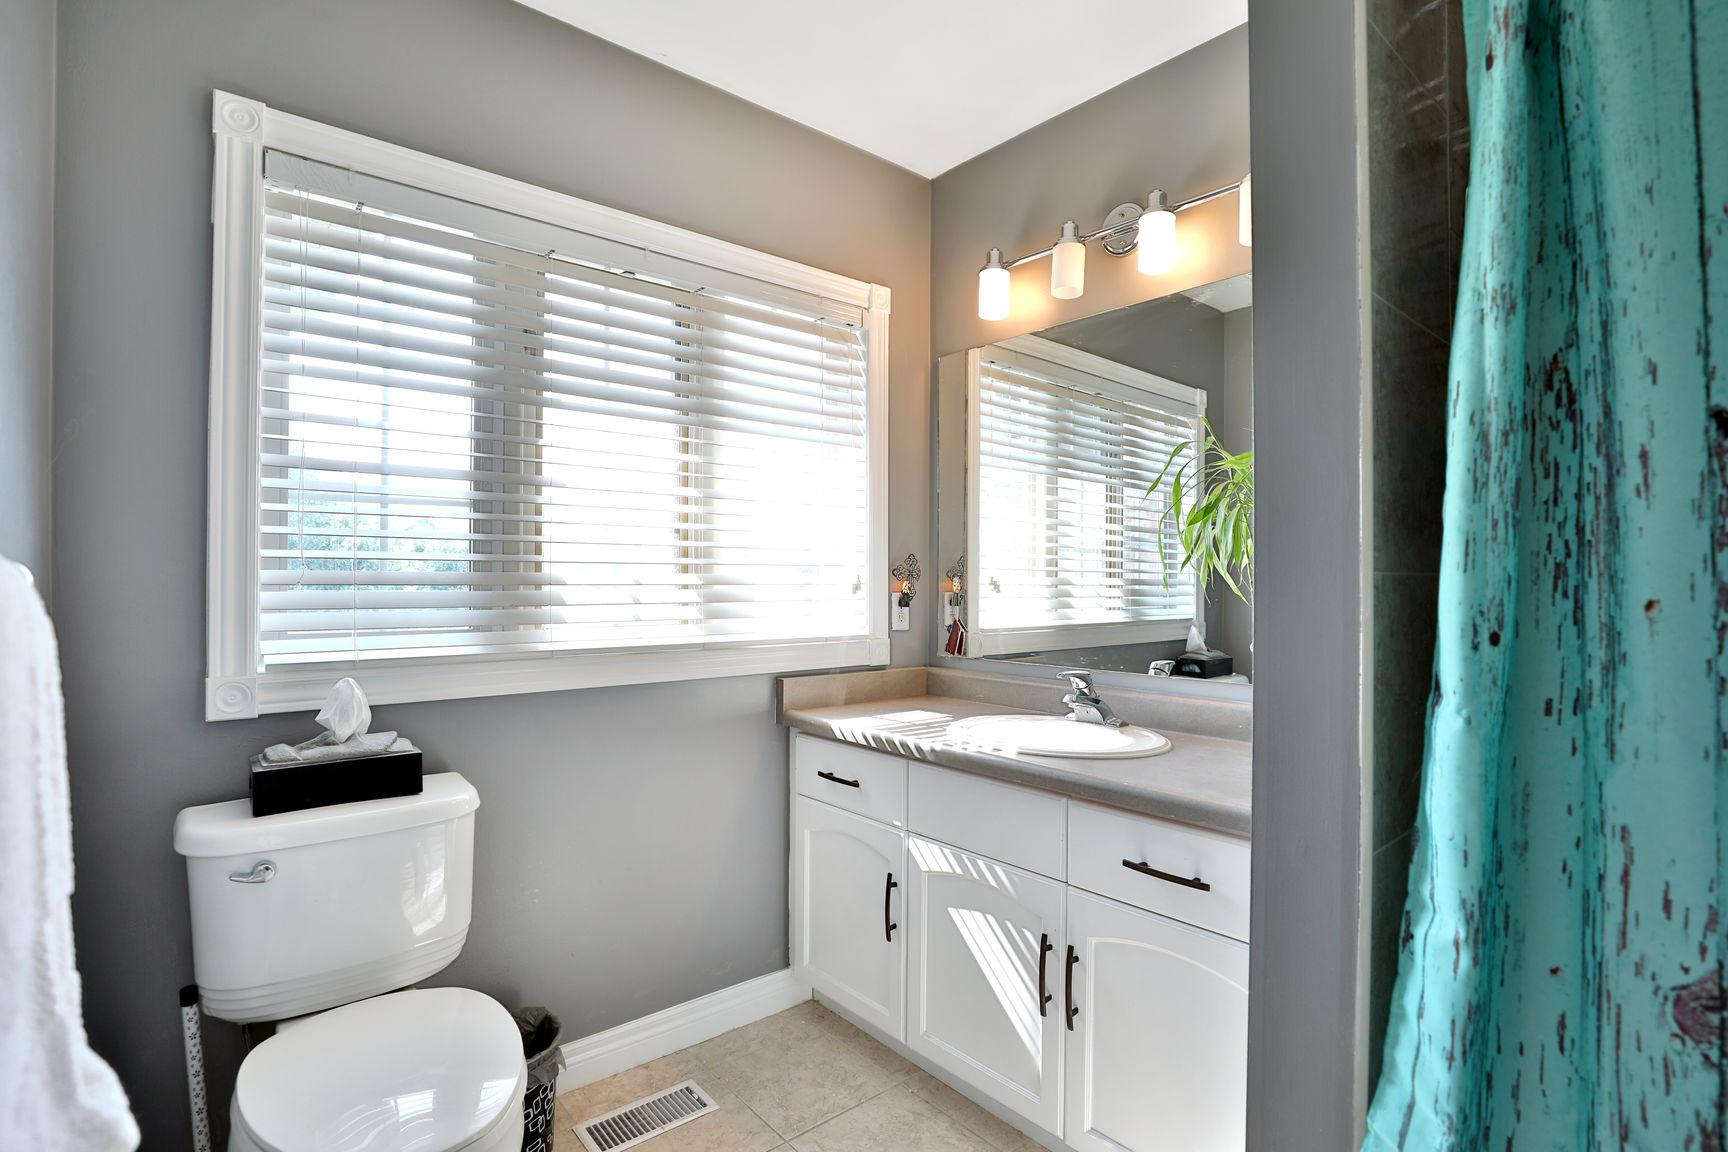 Glanbrook Binbrook 26 Switzer bathroom 2 3 - Recently SOLD in Binbrook